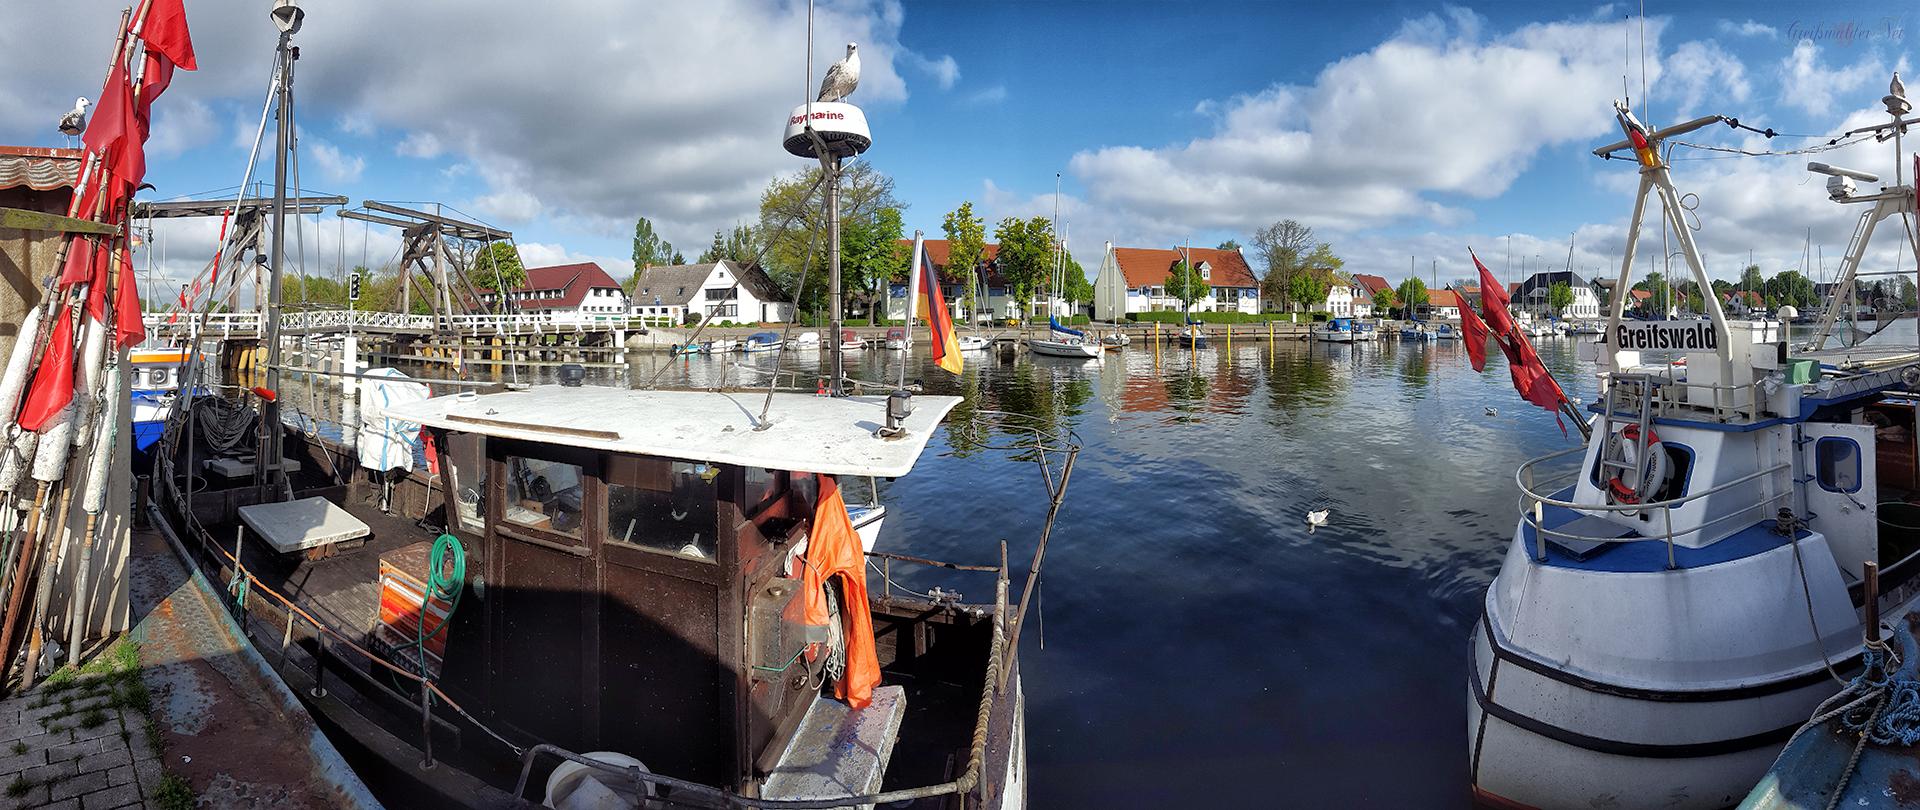 Sonntag in Greifswald-Wieck